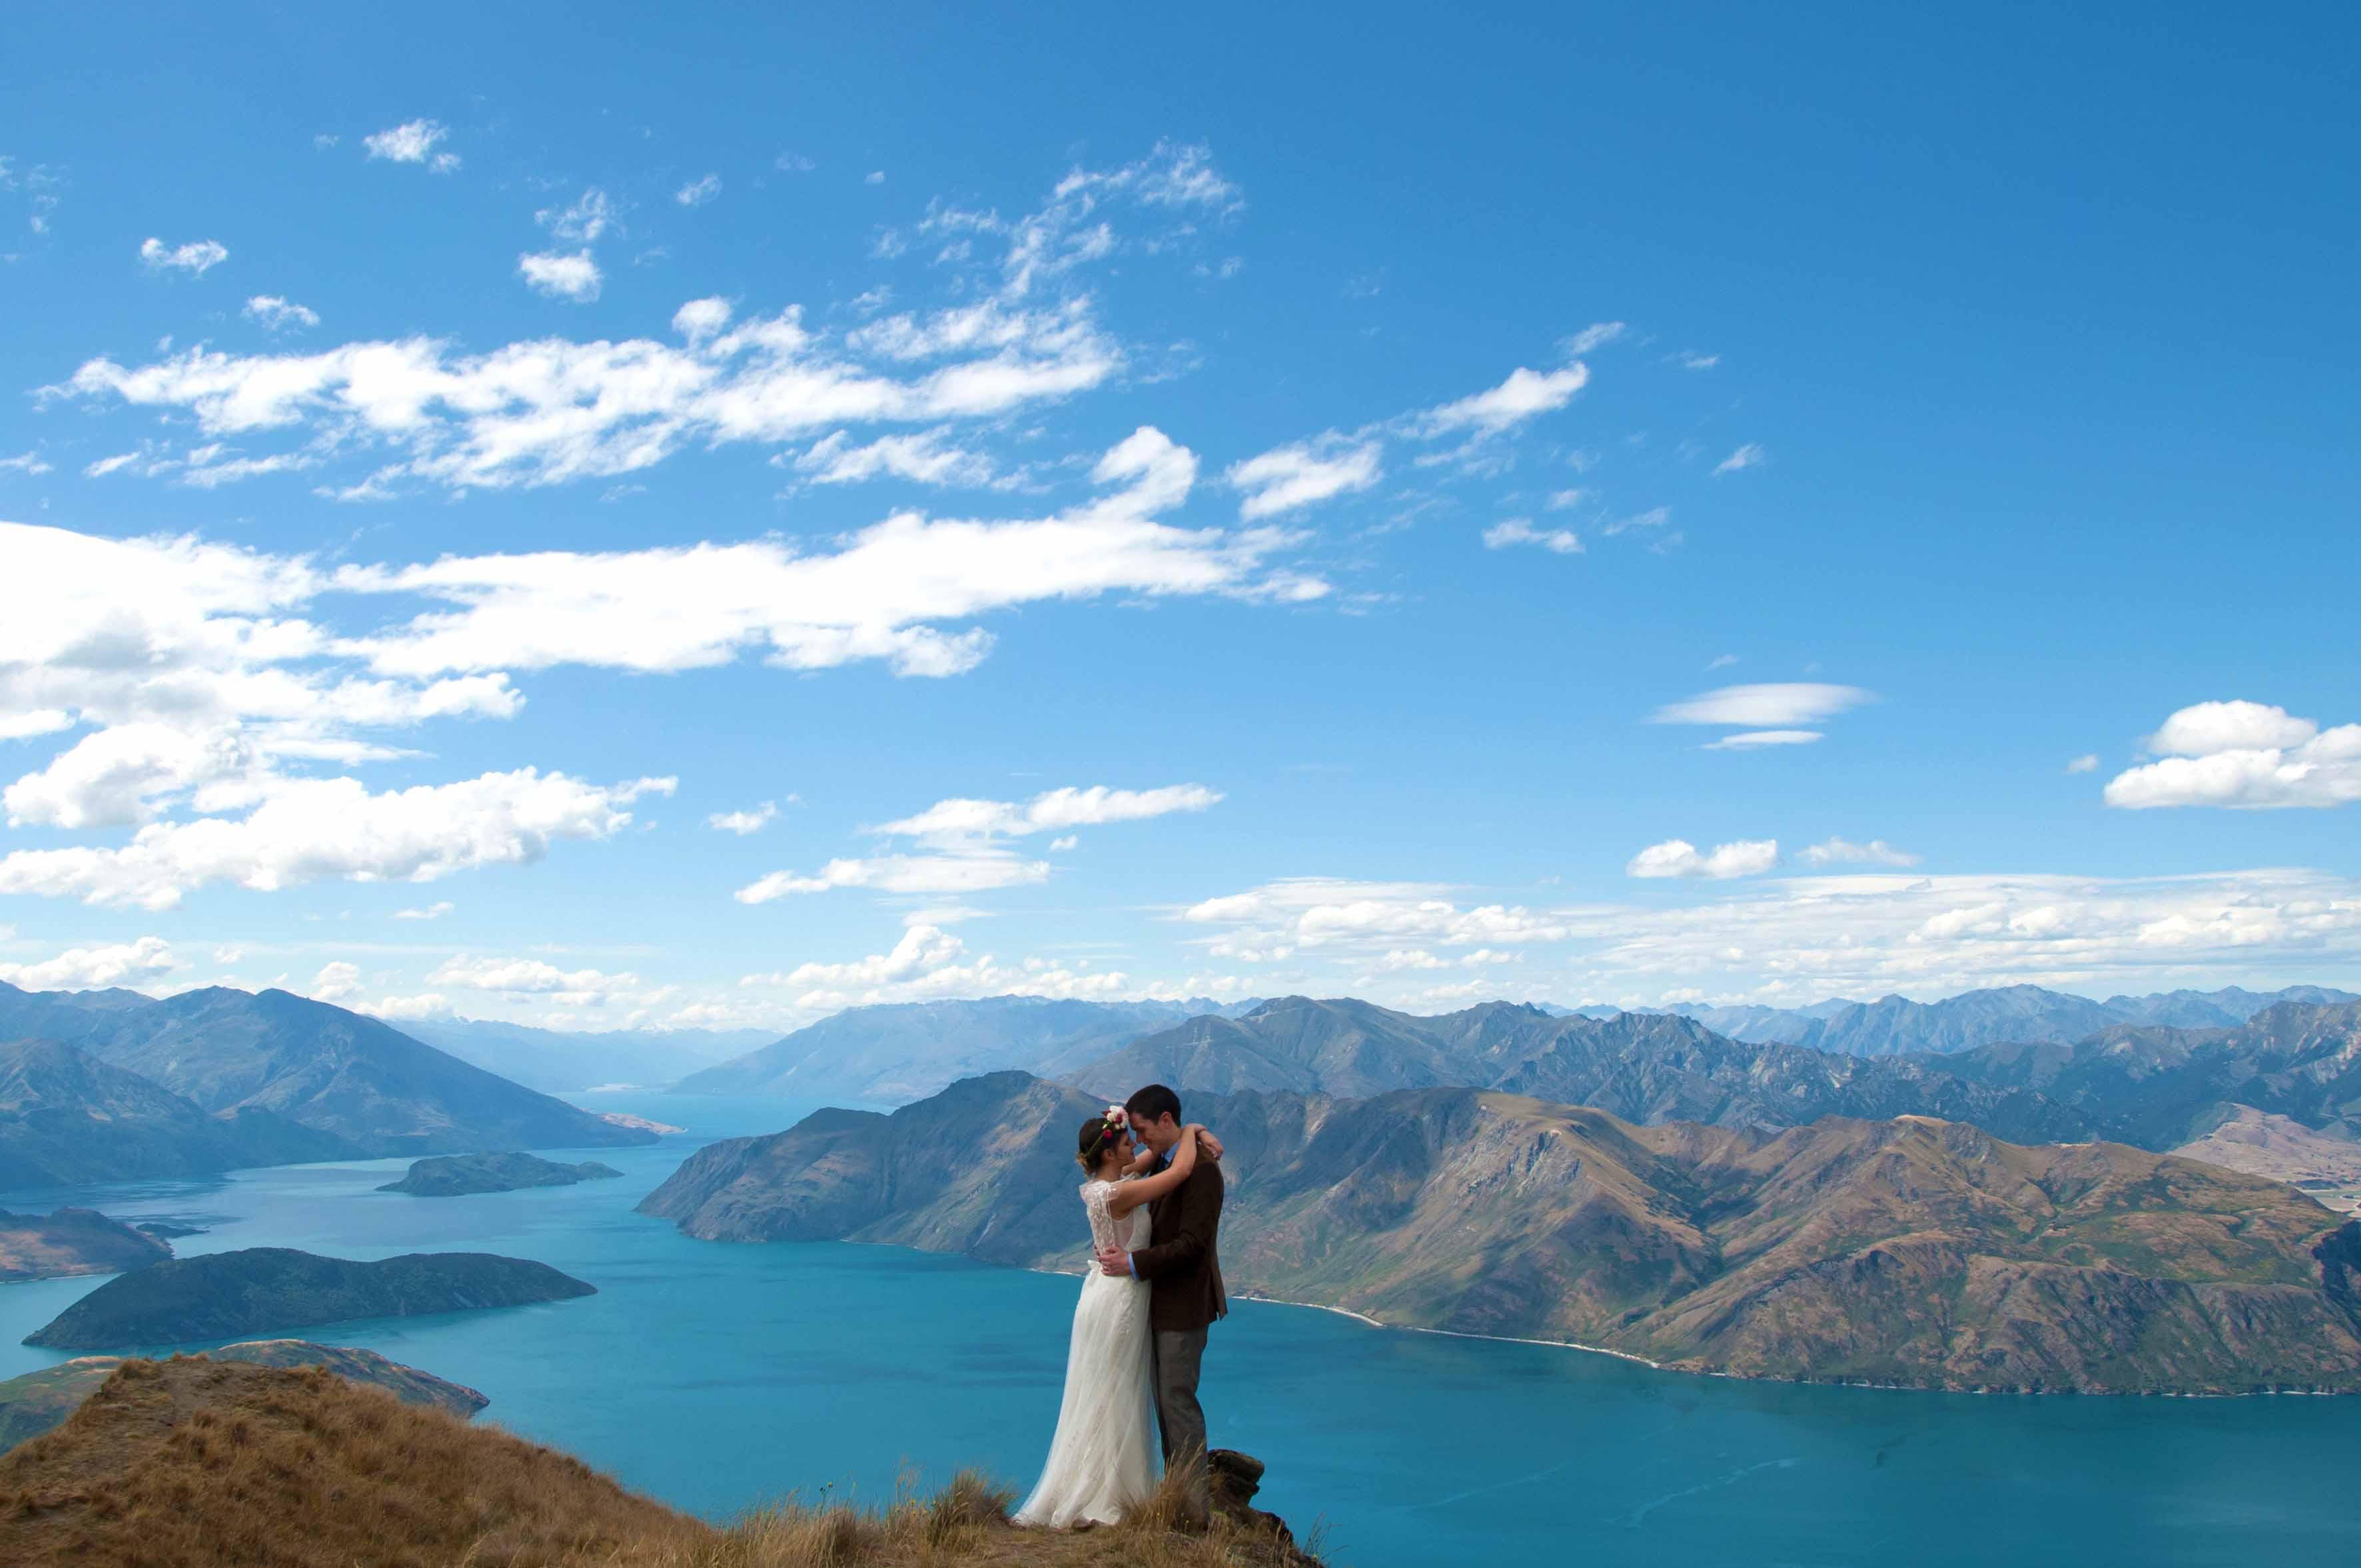 San antonio helicopter wedding